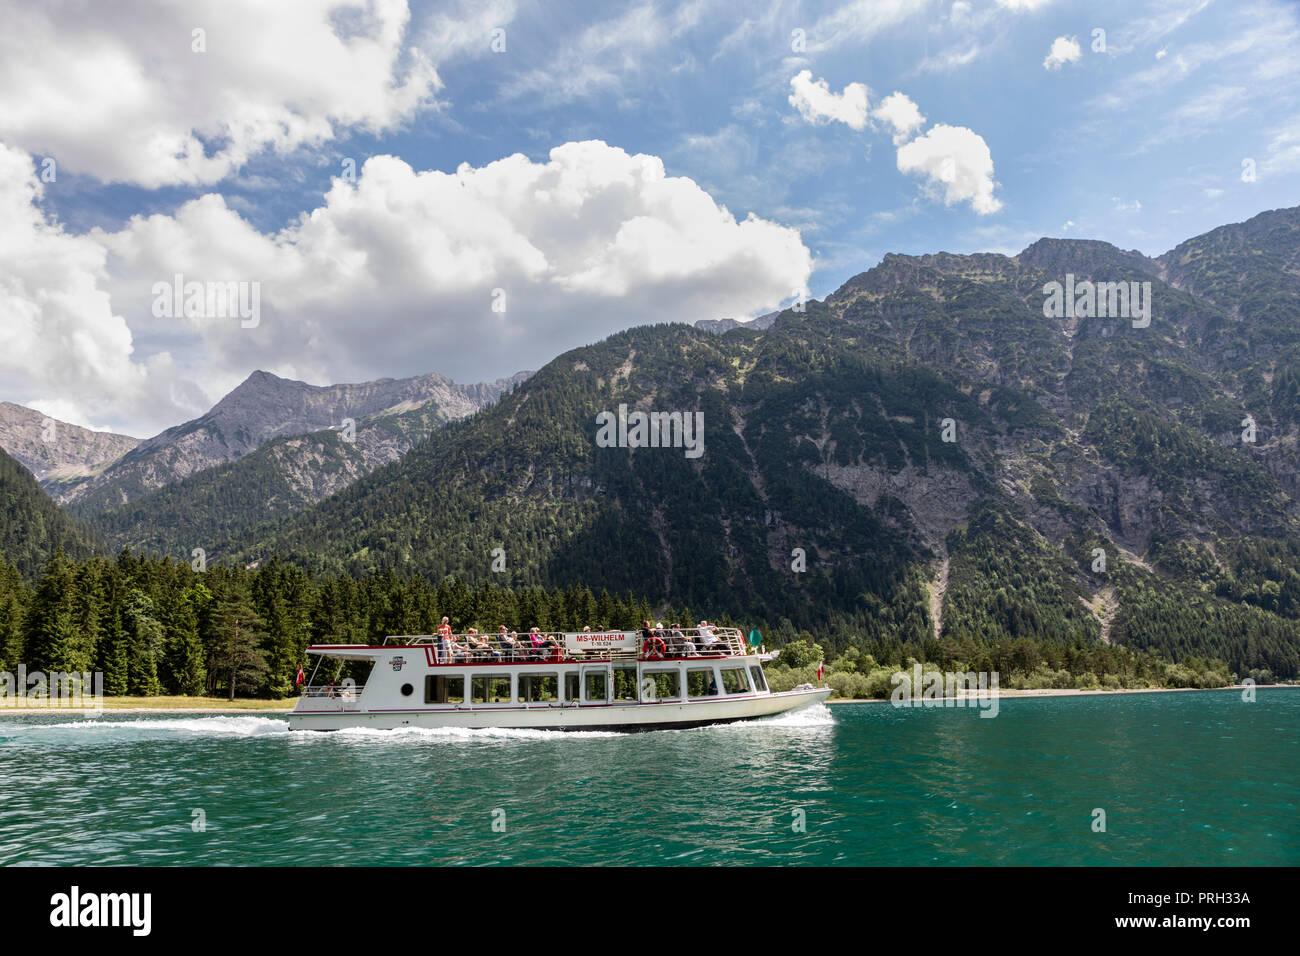 Heiterwanger See, Tyrol, Austria - Stock Image